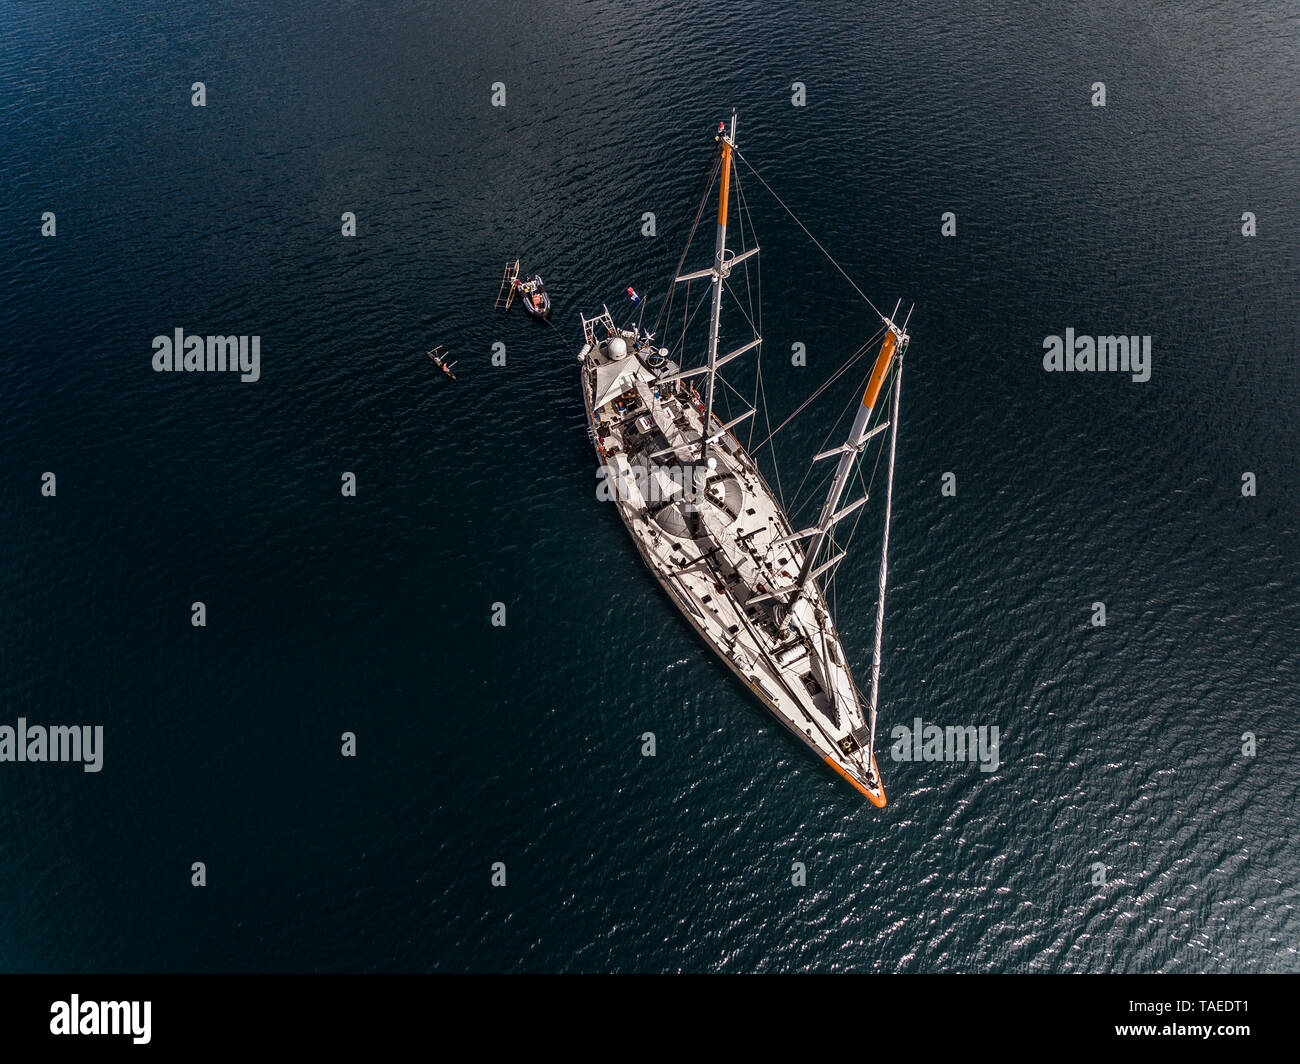 Tara Pacific expedition - november 2017 Tara, Solomon sea, Papua New Guinea, aerial view H68,4. mandatory credit line: Photo: Christoph Gerigk, drone pilot: Guillaume Bourdin - Tara Expeditions Foundation - Stock Image